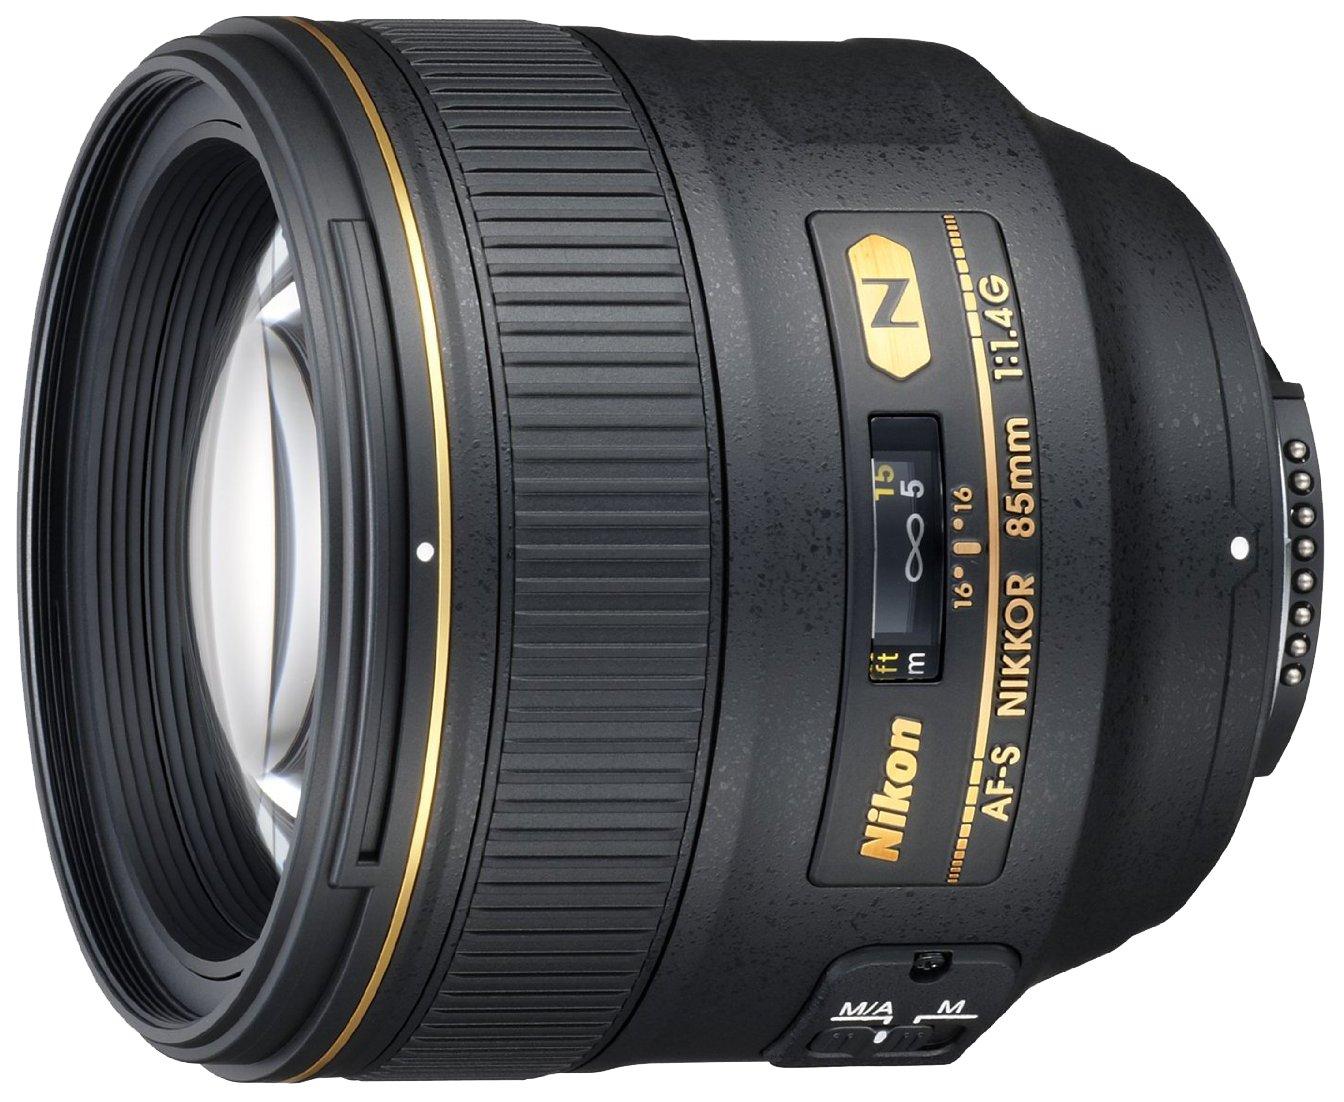 Nikon lens 85mm/1.4G